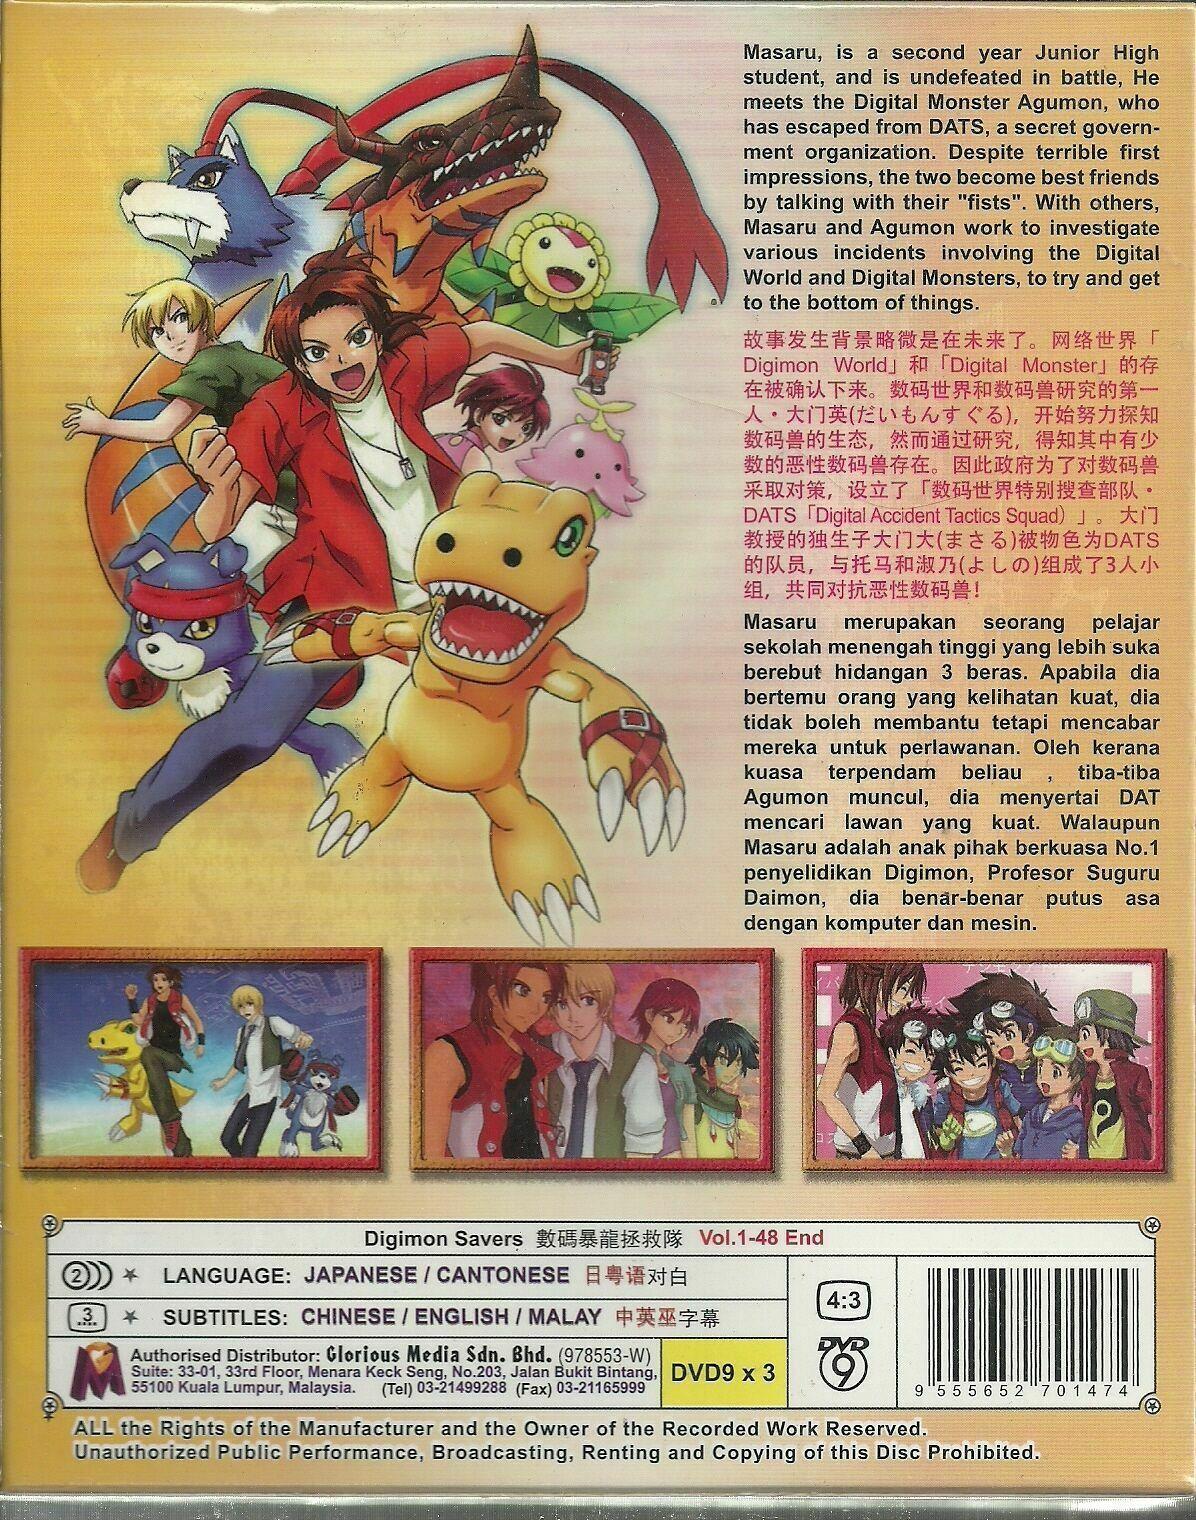 DIGIMON SAVERS - COMPLETE TV SERIES DVD BOX (1-48 EPS) Ship From USA